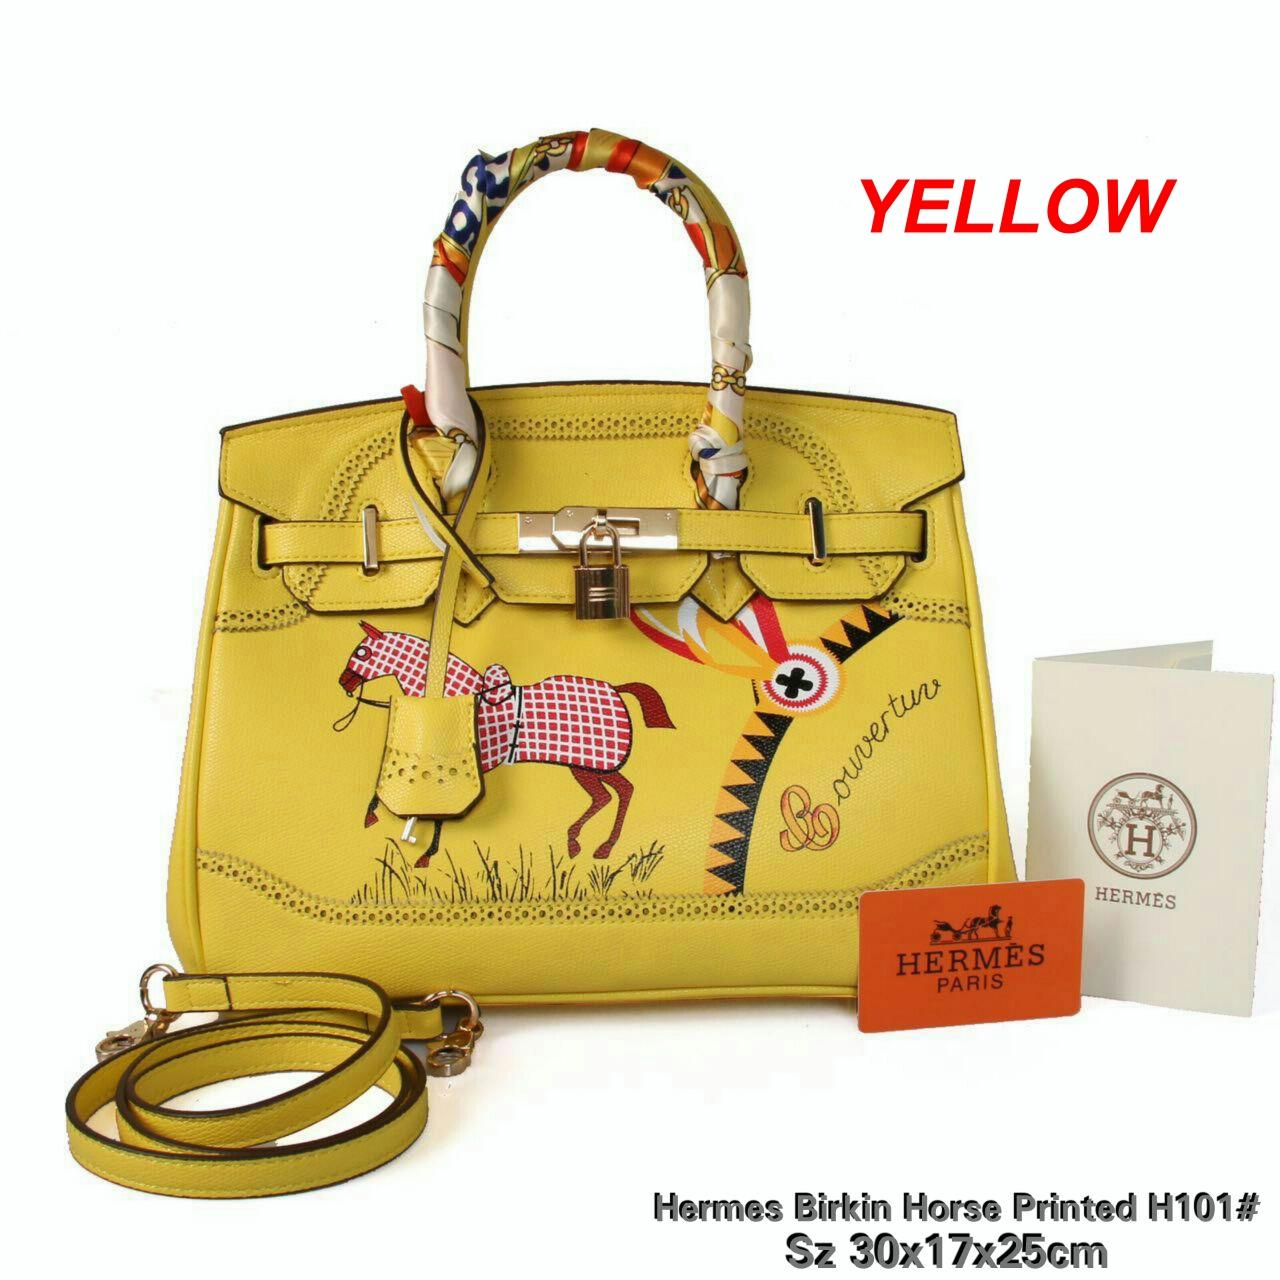 hermes birkin replica handbags - Grosir Tas Murah / Jual Tas Murah / Cherry Tas: HERMES BIRKIN ...